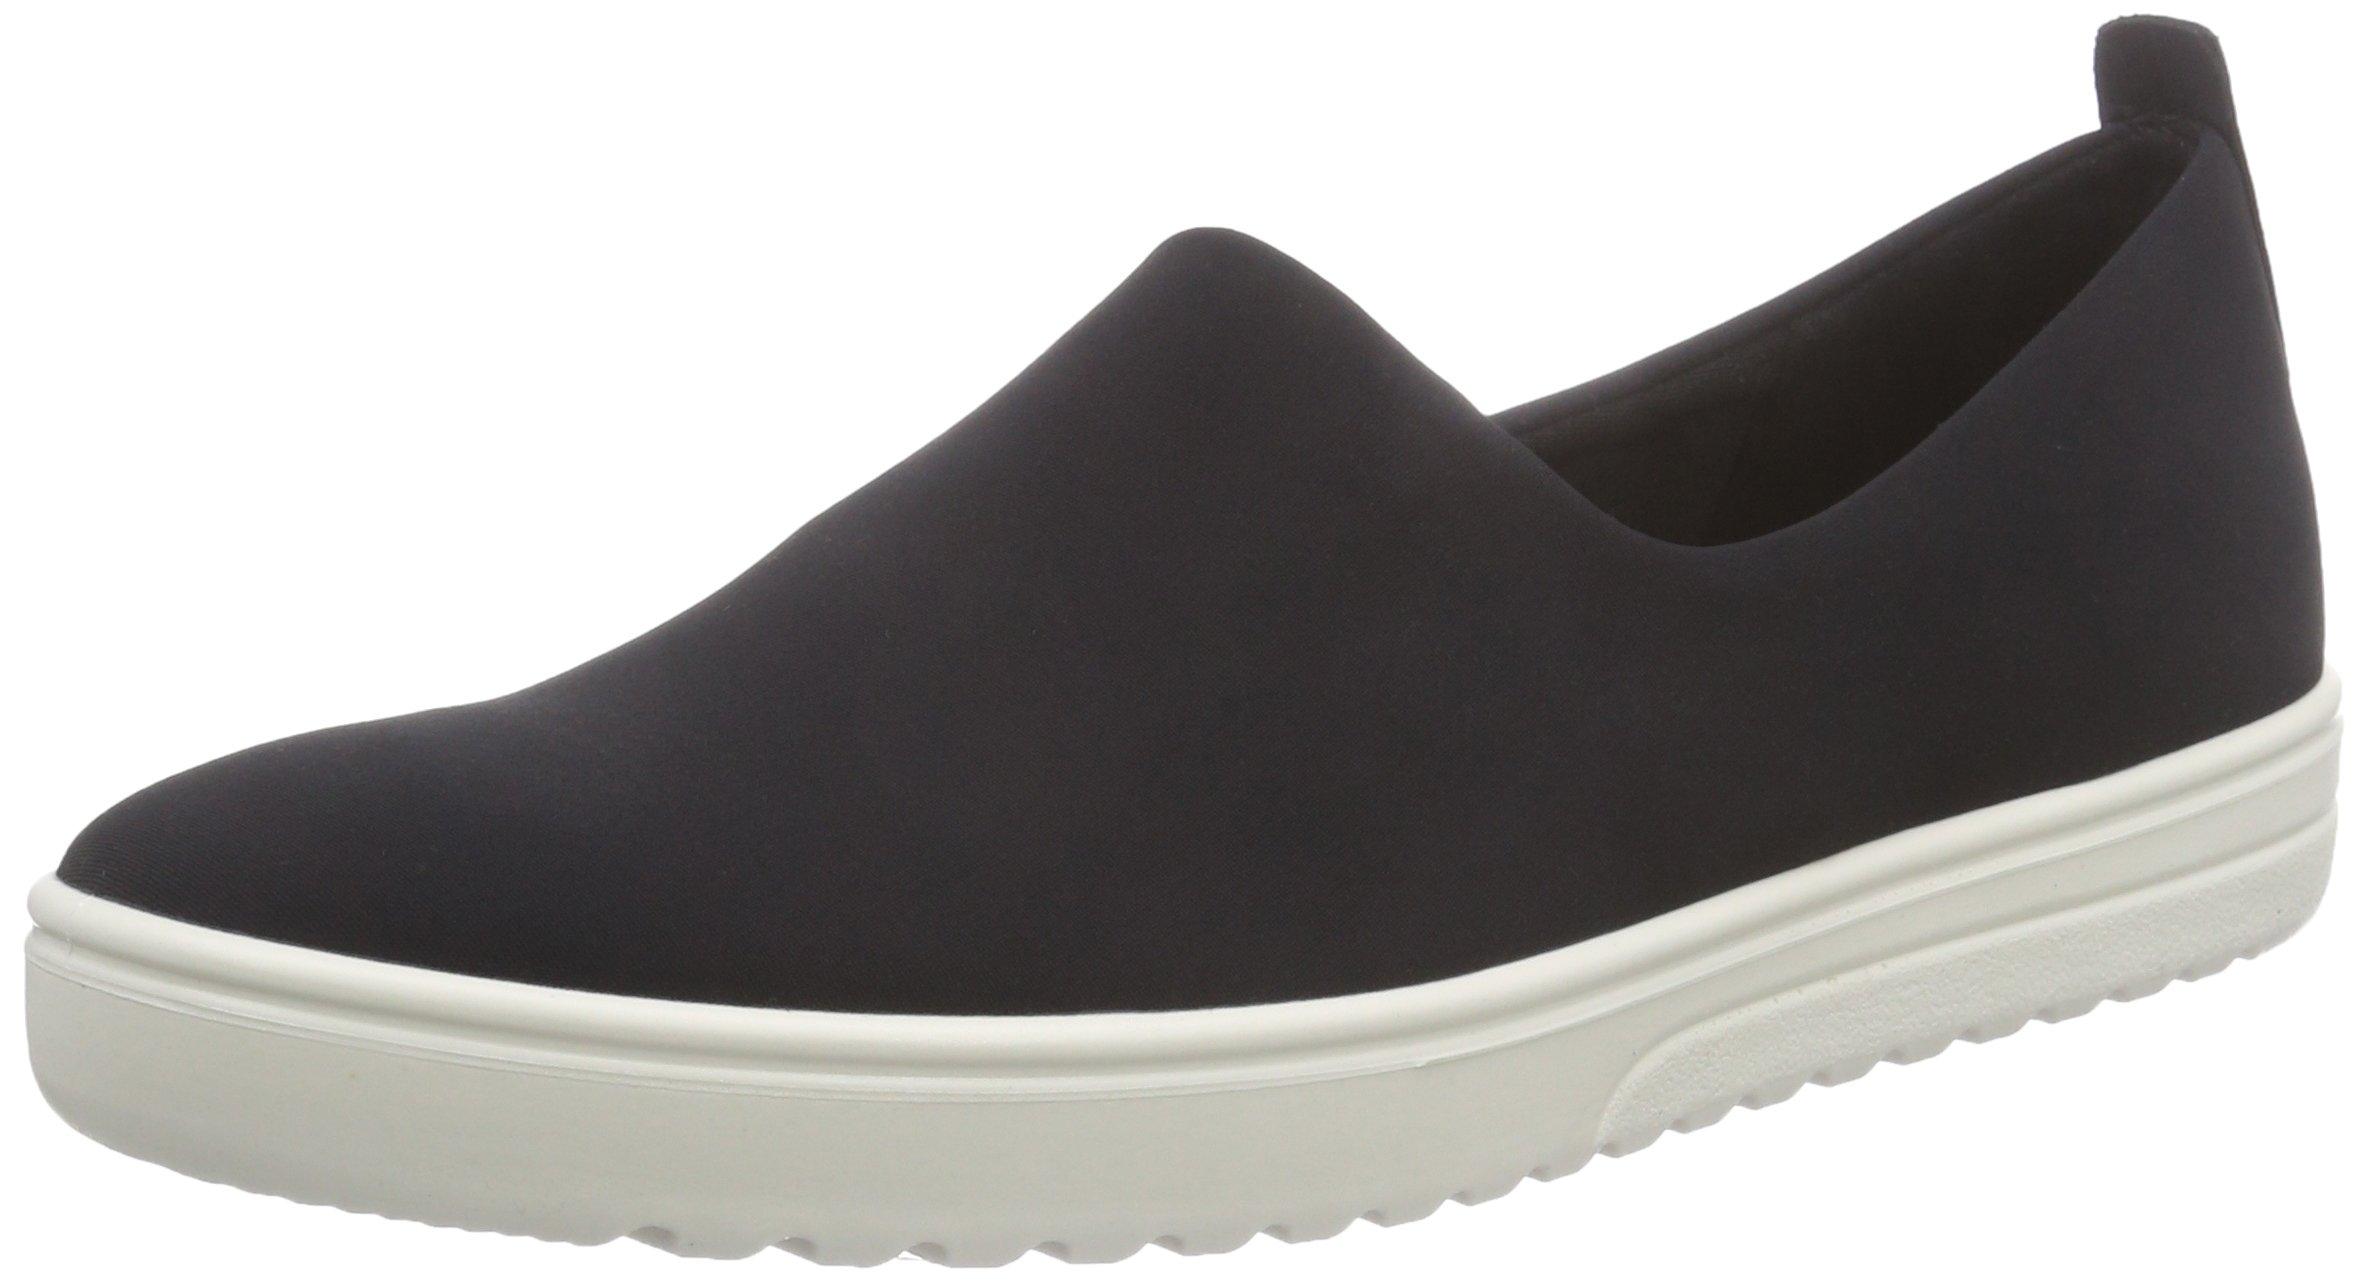 Ecco Footwear Womens Fara Slip-On Loafer, Black/Black, 35 EU/4-4.5 M US